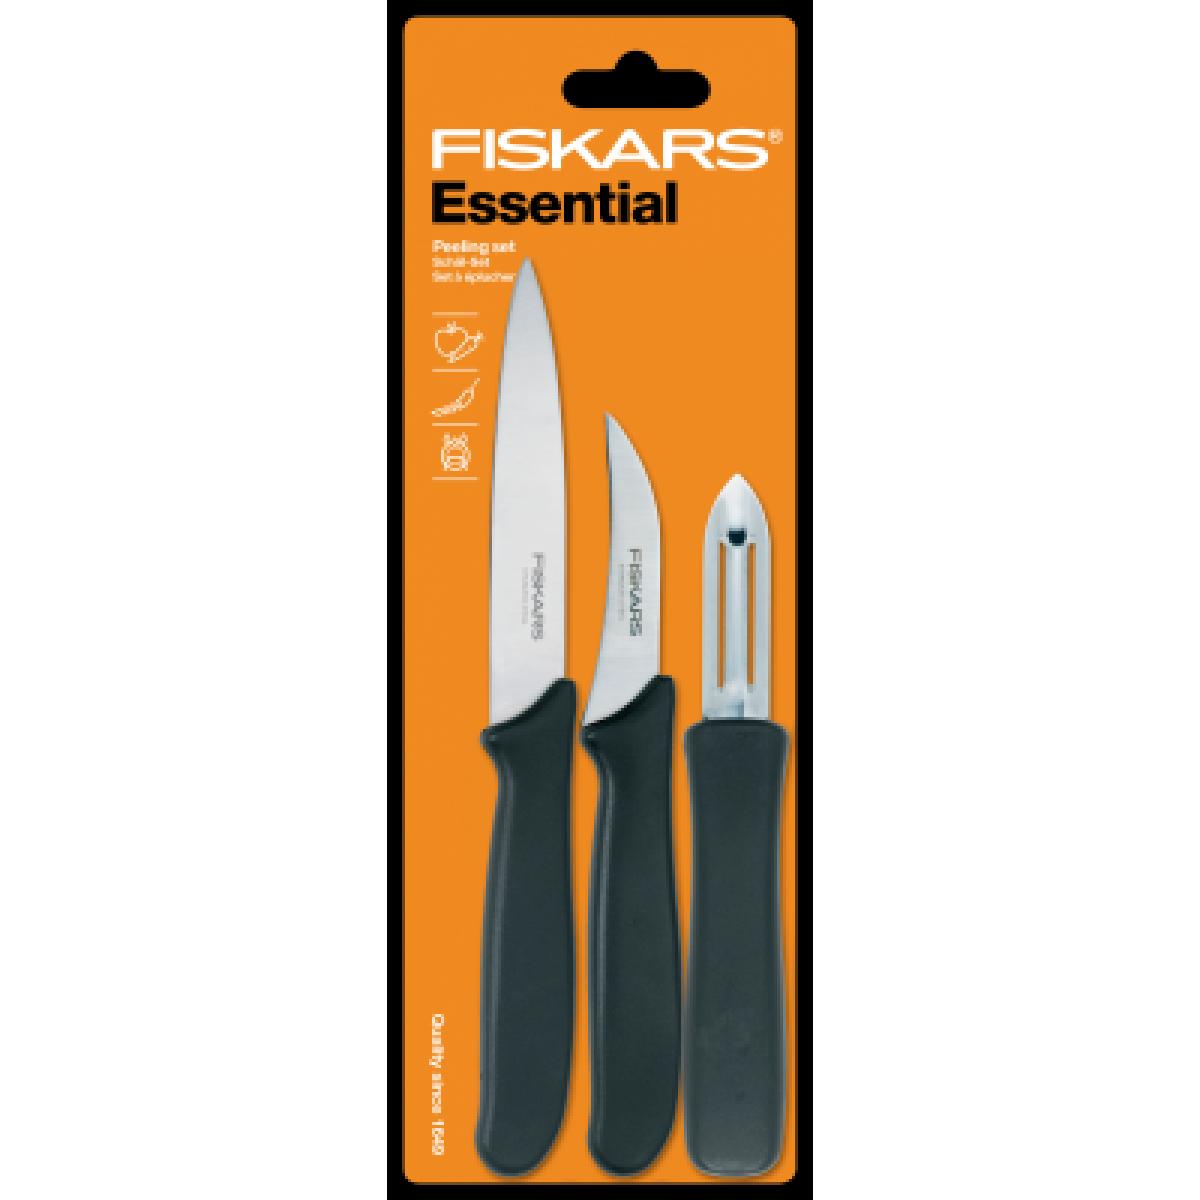 FISKARS Essential knivsæt 3 dele